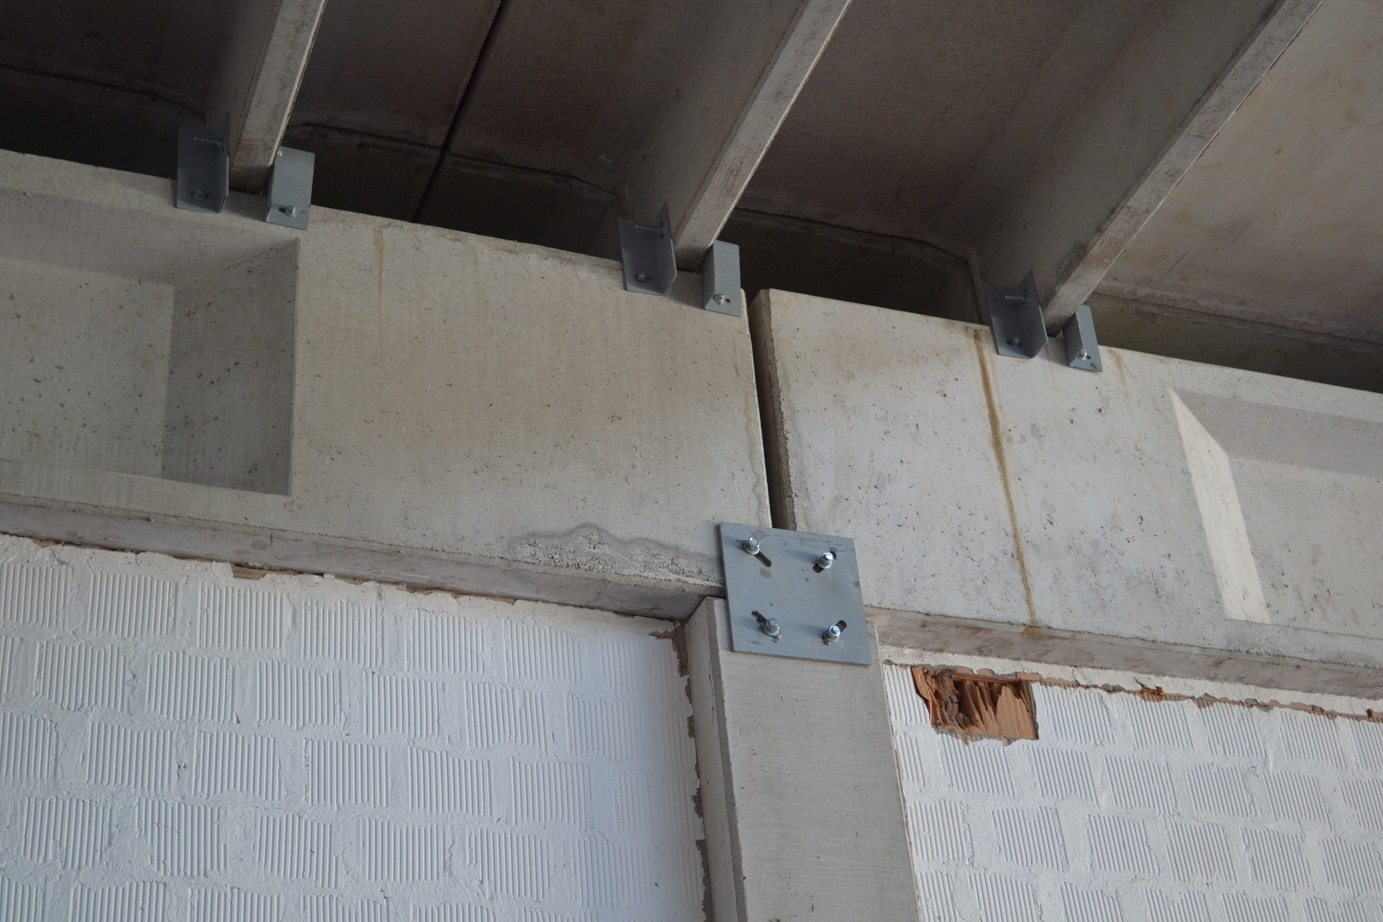 miglioramento antisismico edifici industriali > eiseko computers